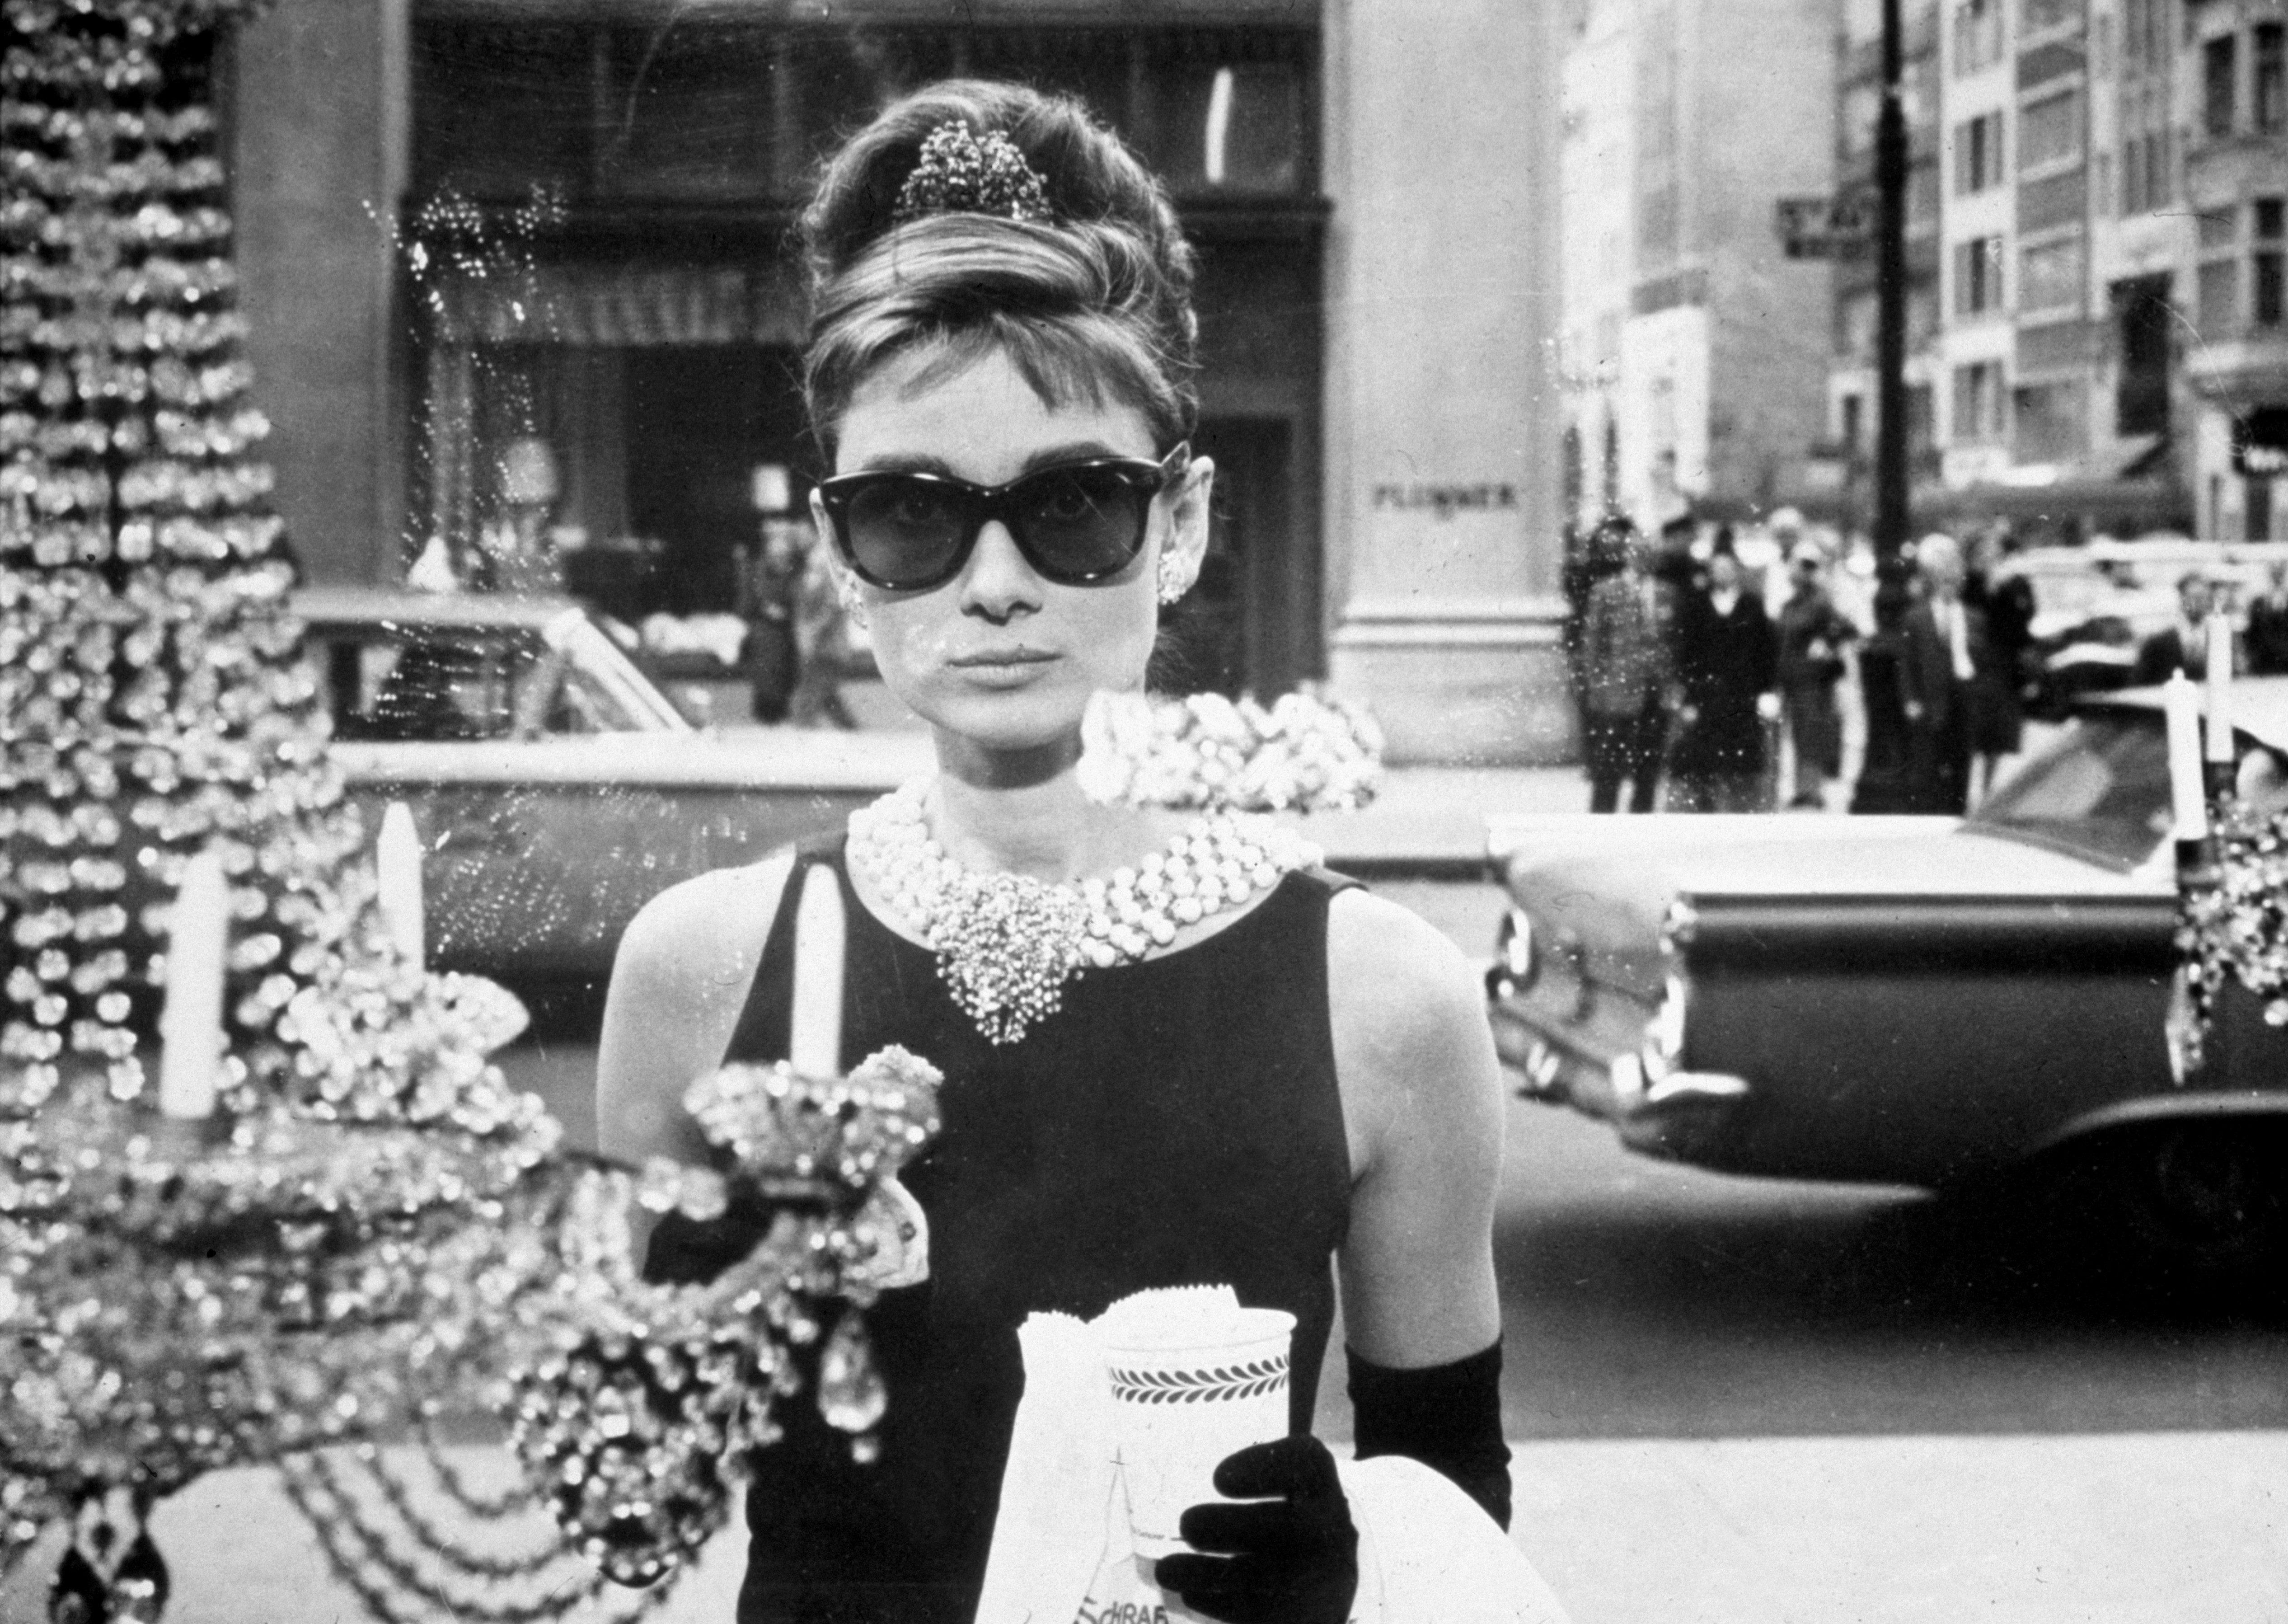 Audrey Hepburn 'Breakfast at Tiffany's,' fashion movie